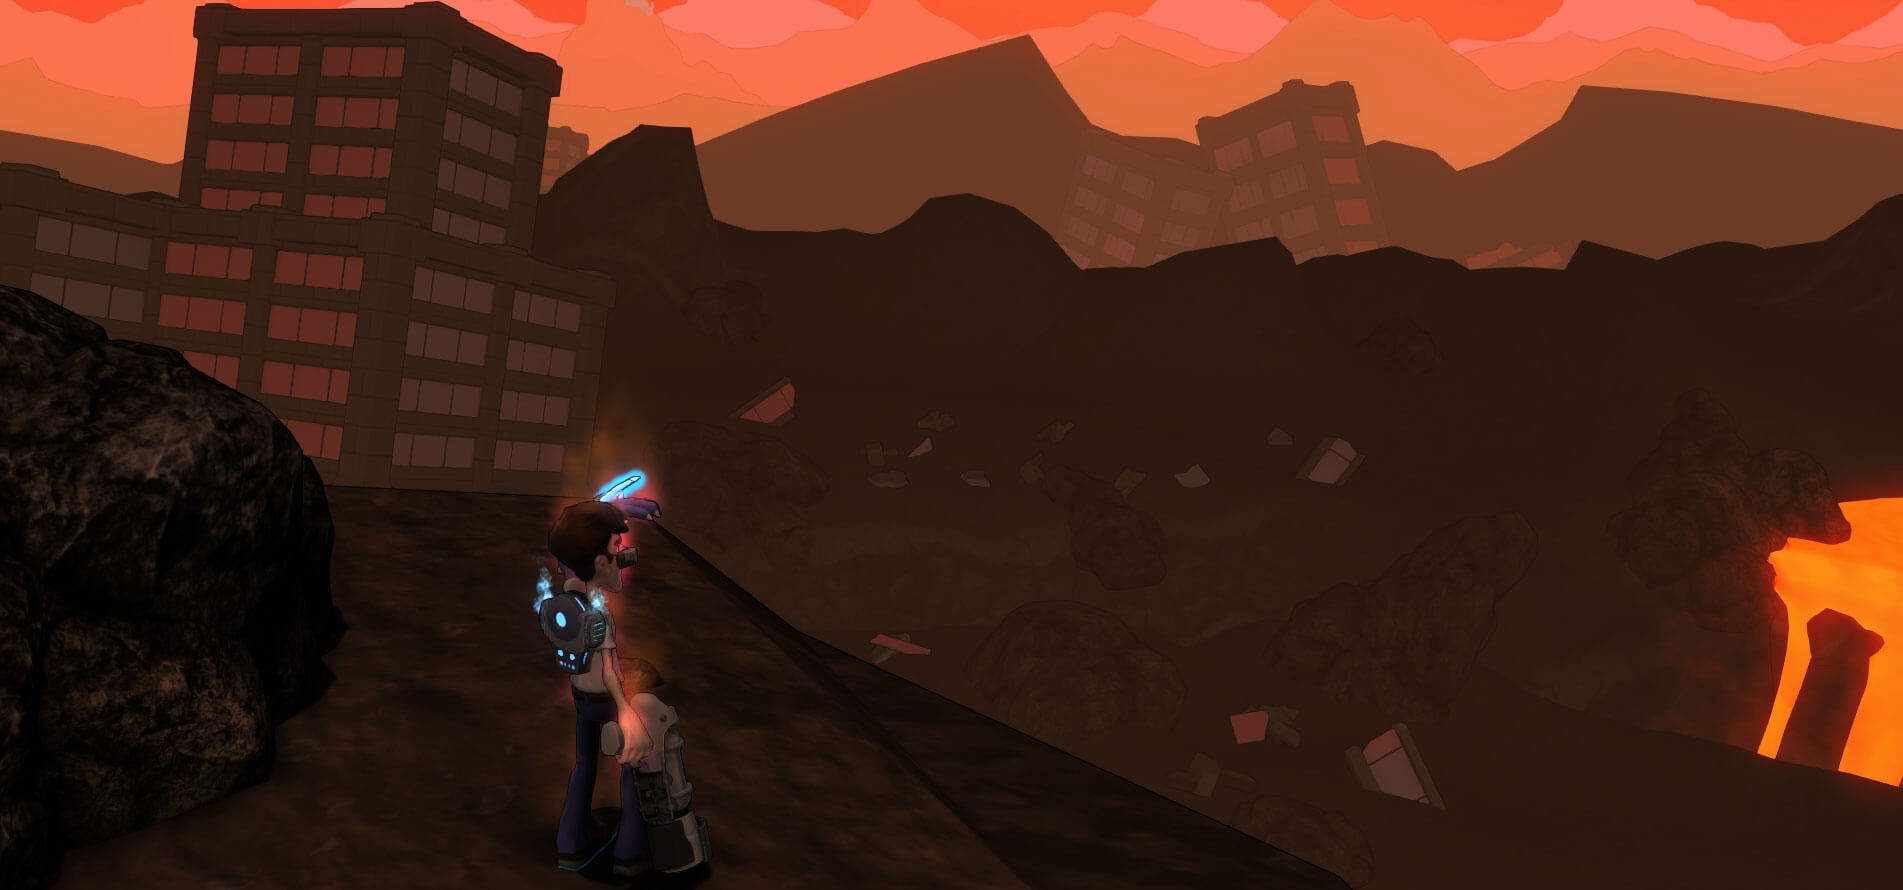 Höllischer Ausblick - Bildrechte bei Darkmire Entertainment